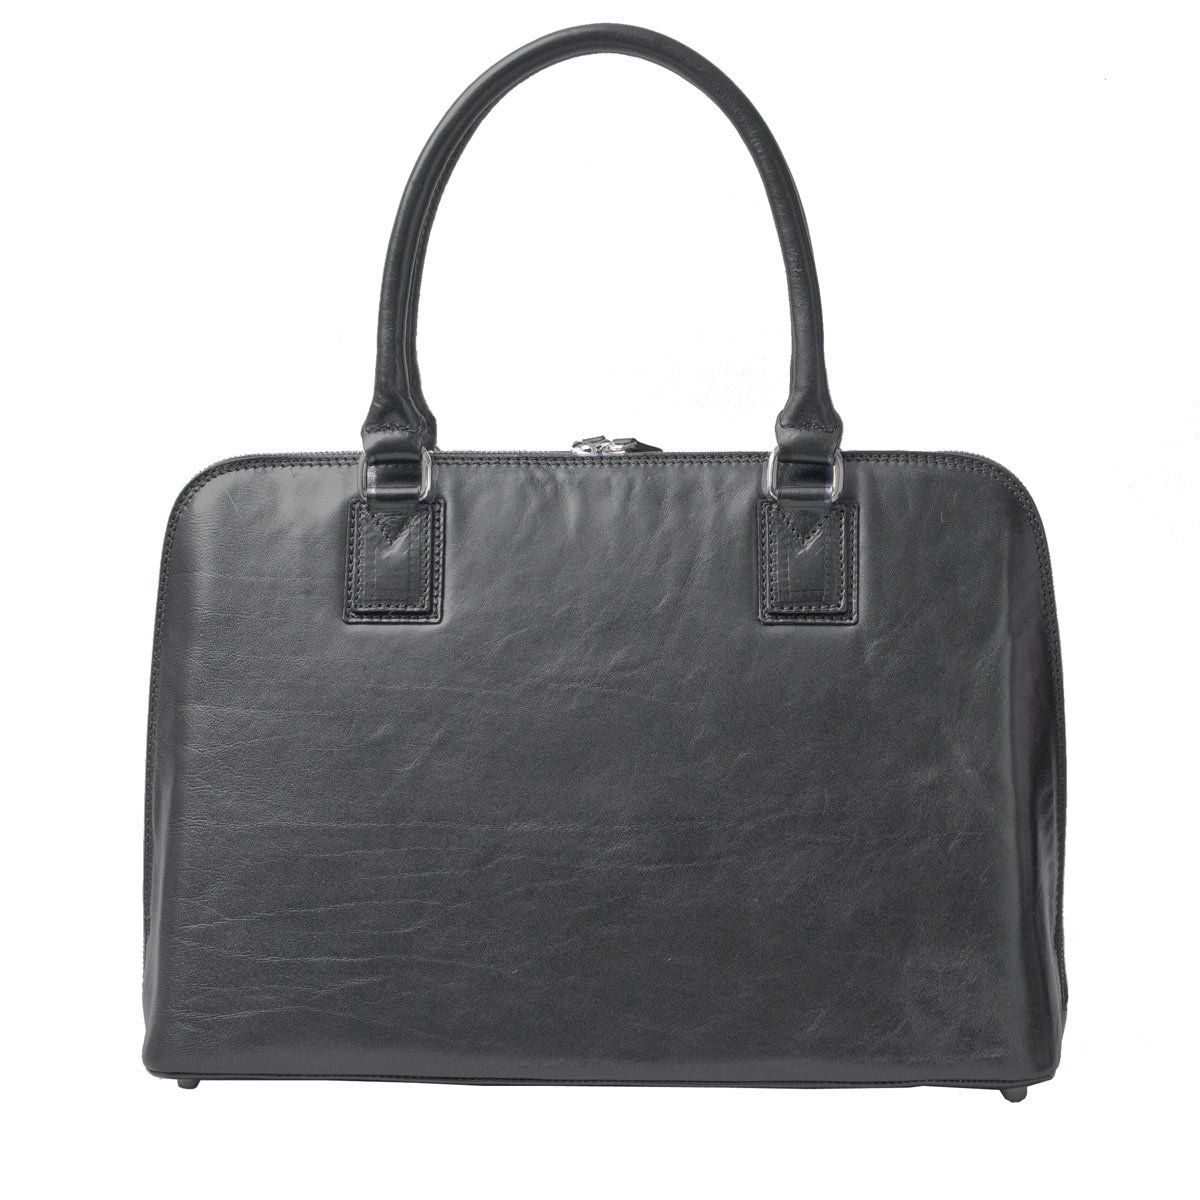 Maxwell Scott Luxury Ladies Black Leather Work Bag Purse for Macbook (Fiorella) by Maxwell Scott Bags (Image #5)